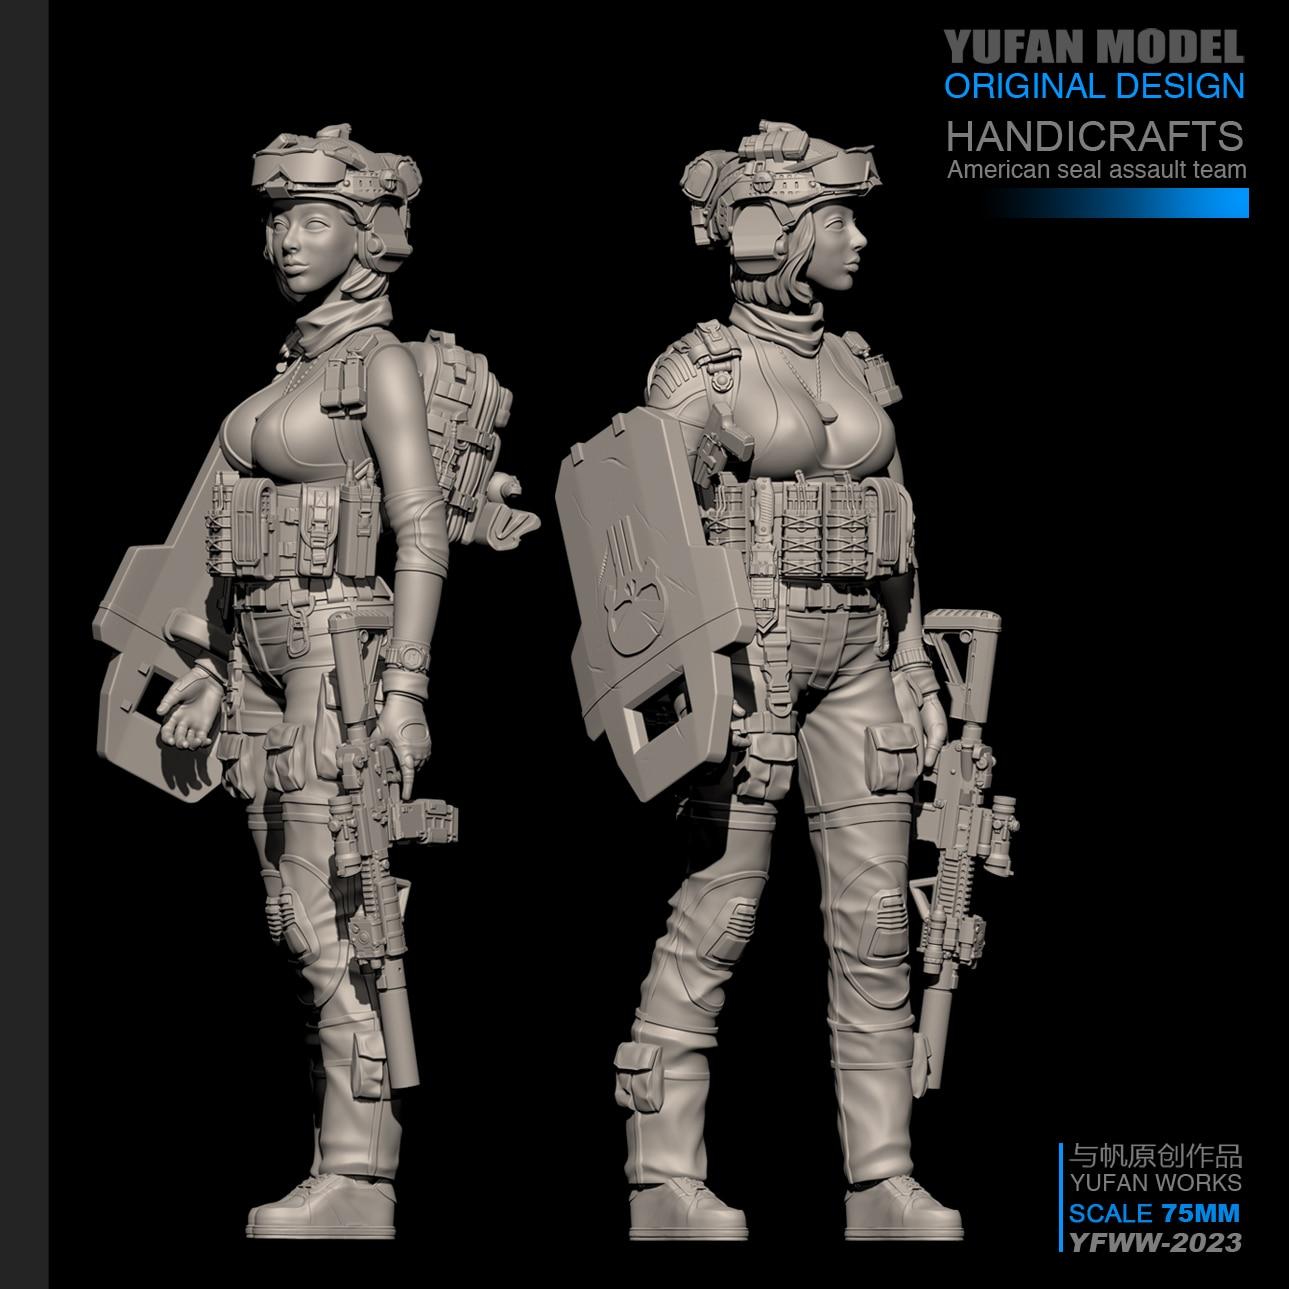 YUFan Model 1/24 Resin Kits Modern Female Soldier Resin Soldier Self-assembled (75mm) YFWW-2023